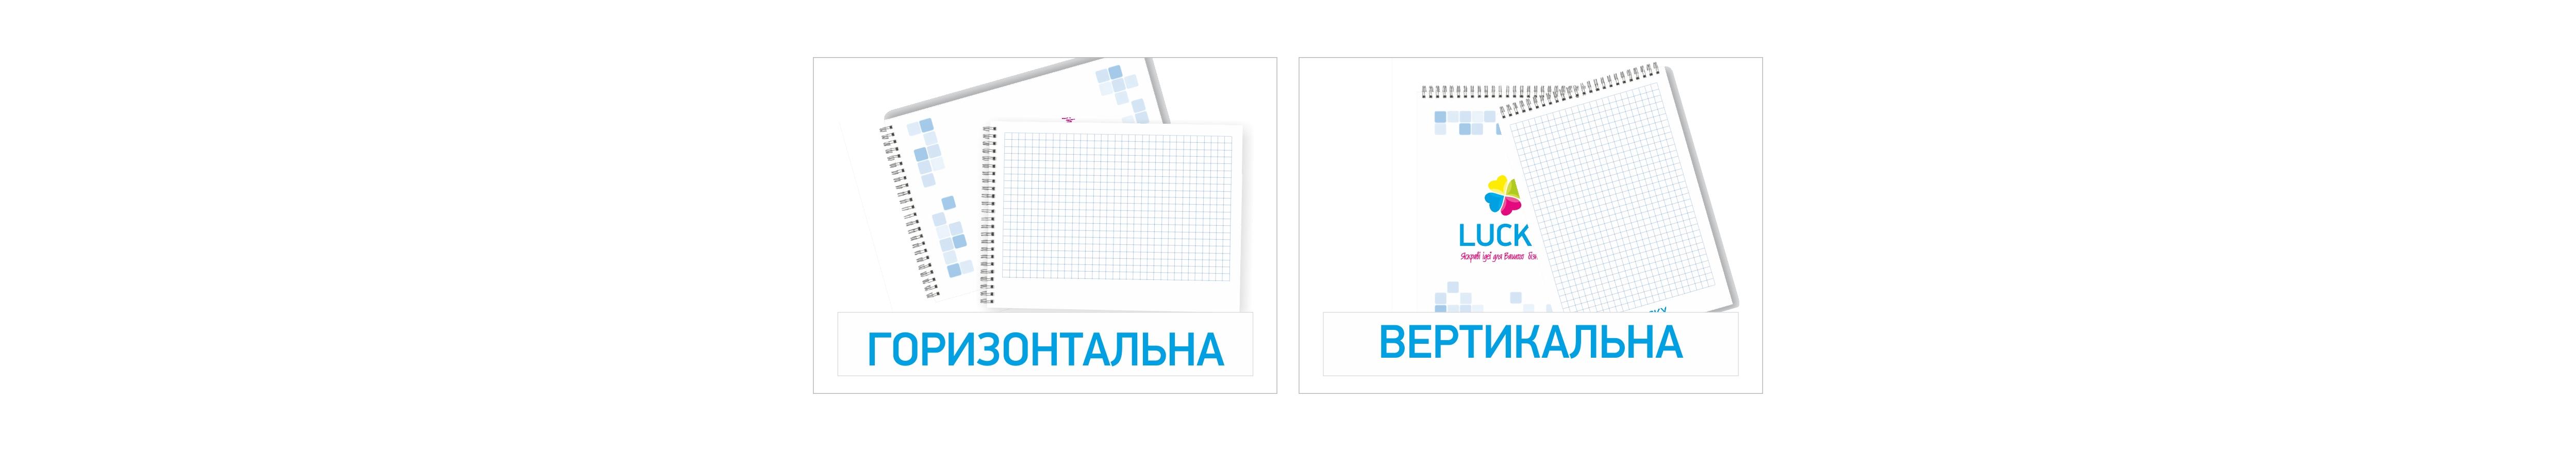 bloknot s logotipom_1